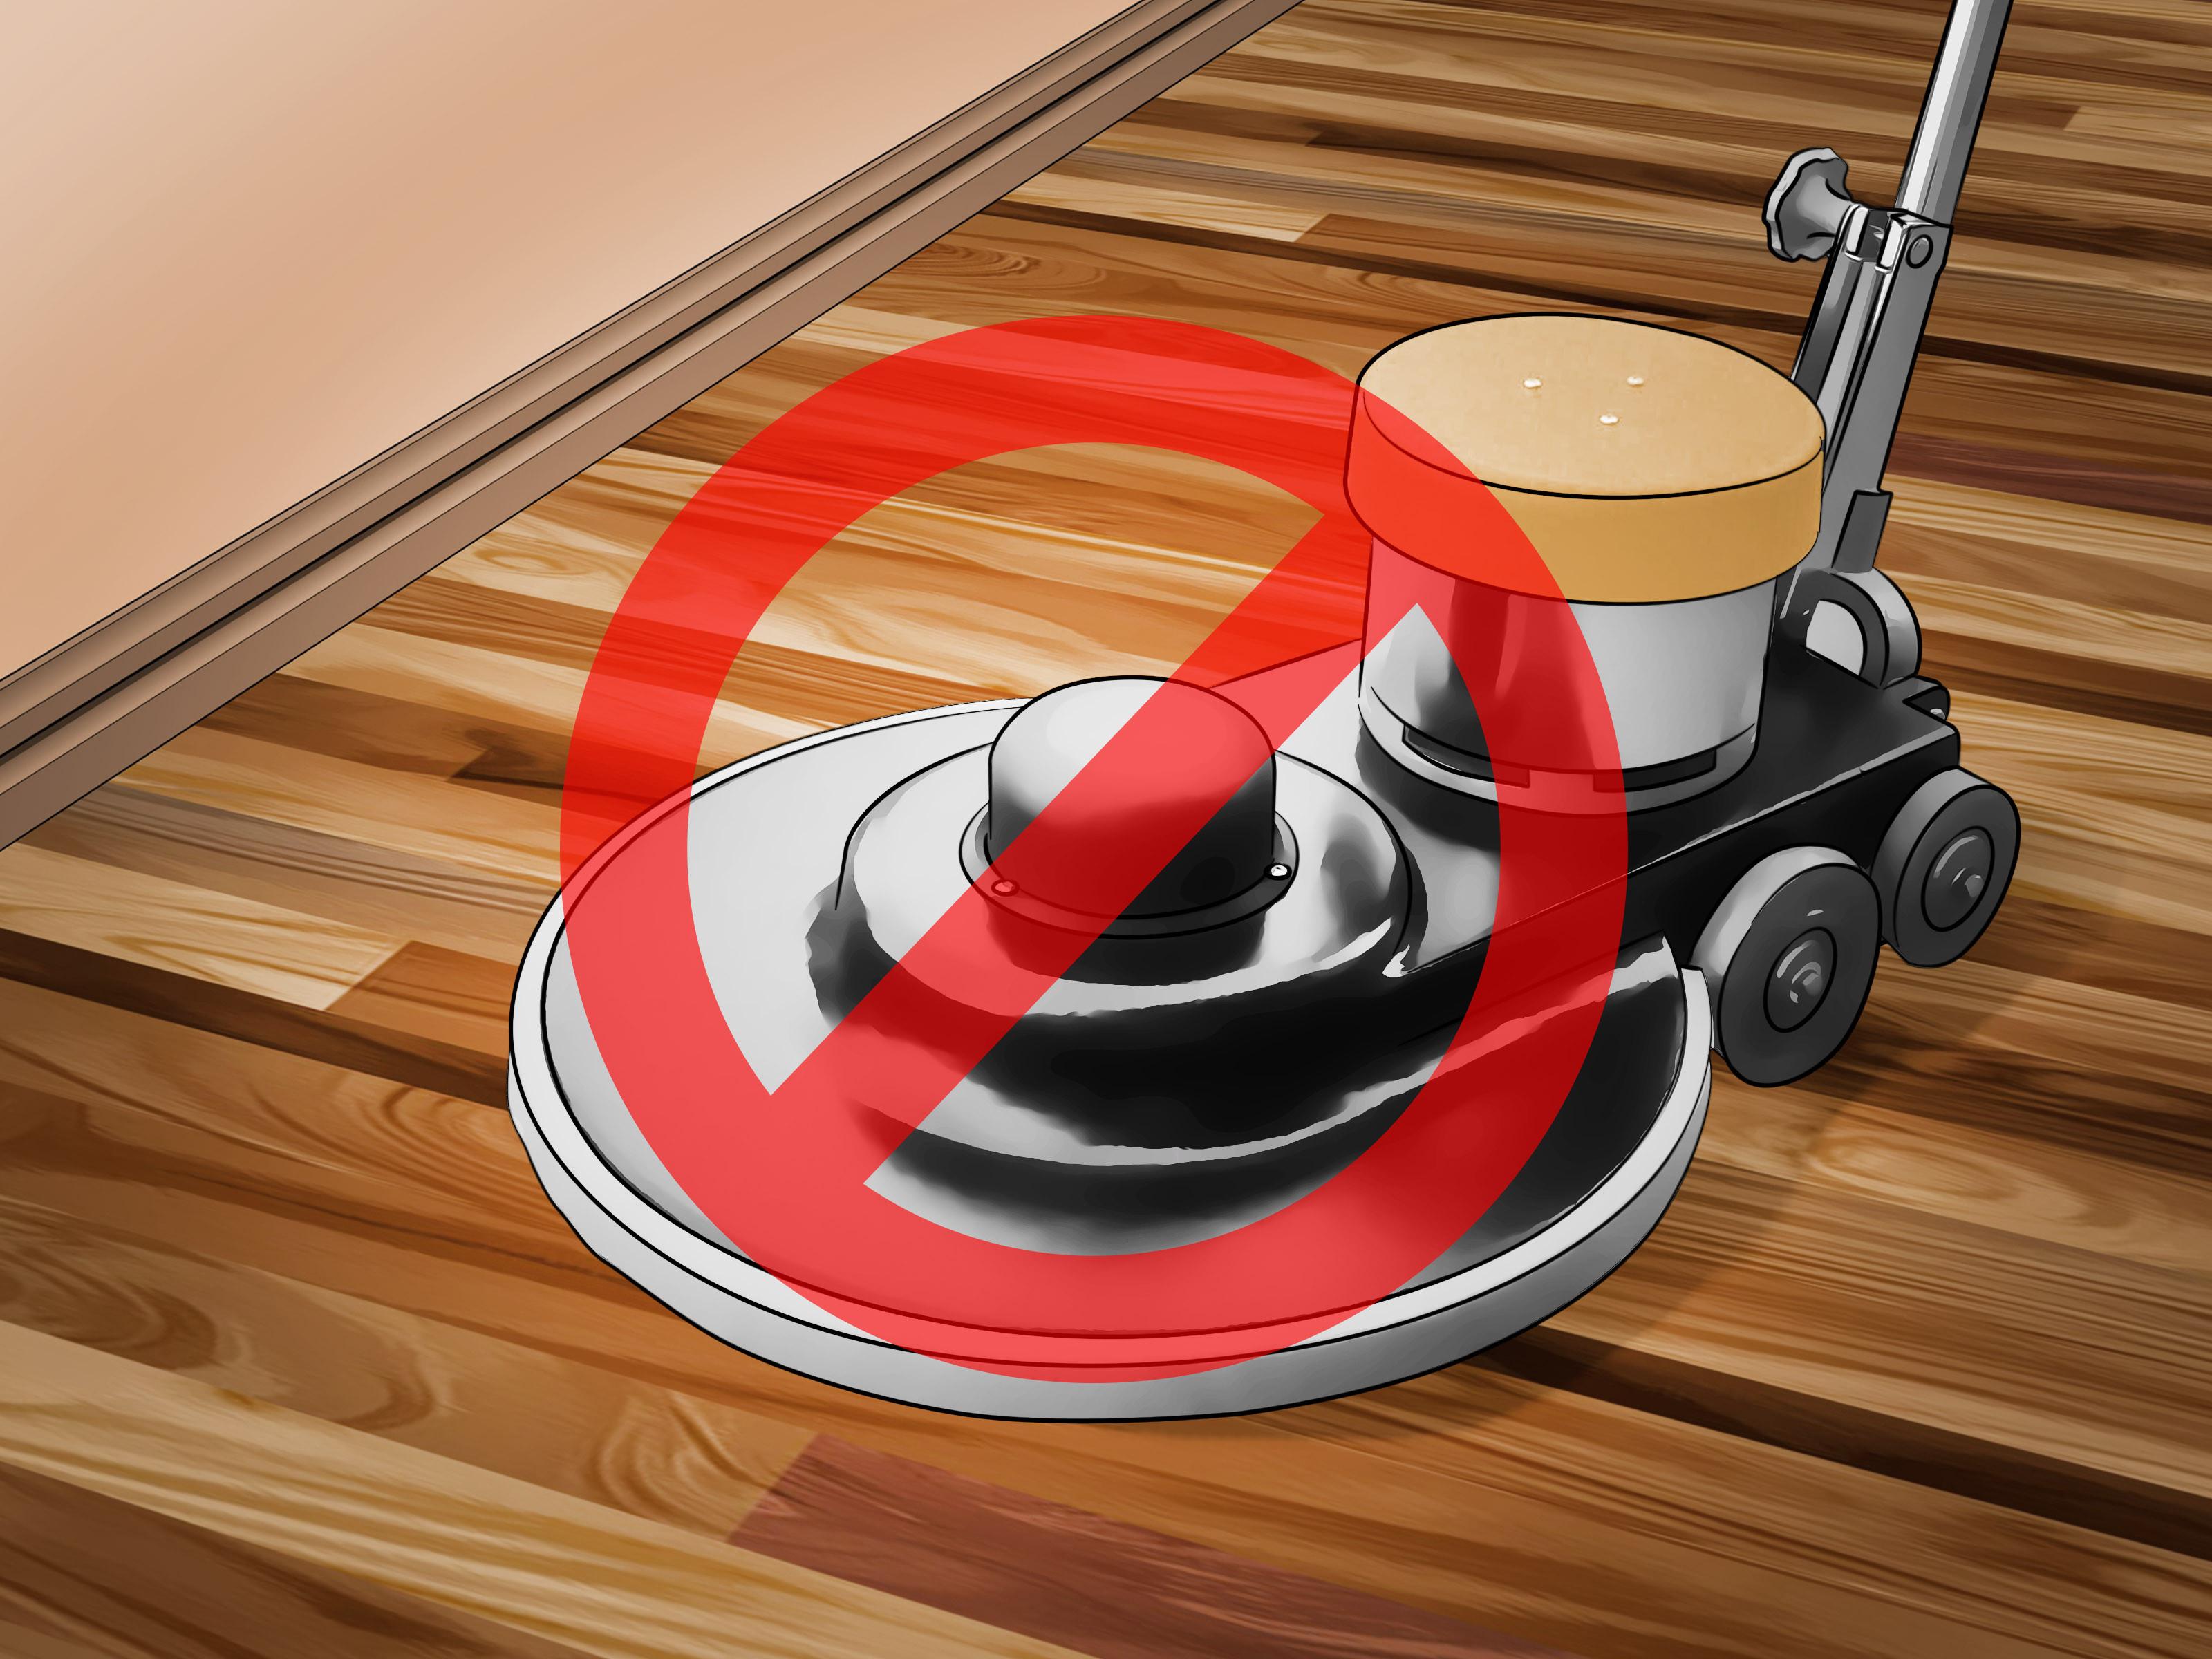 glue down hardwood floor problems of 4 ways to clean polyurethane wood floors wikihow intended for clean polyurethane wood floors step 15